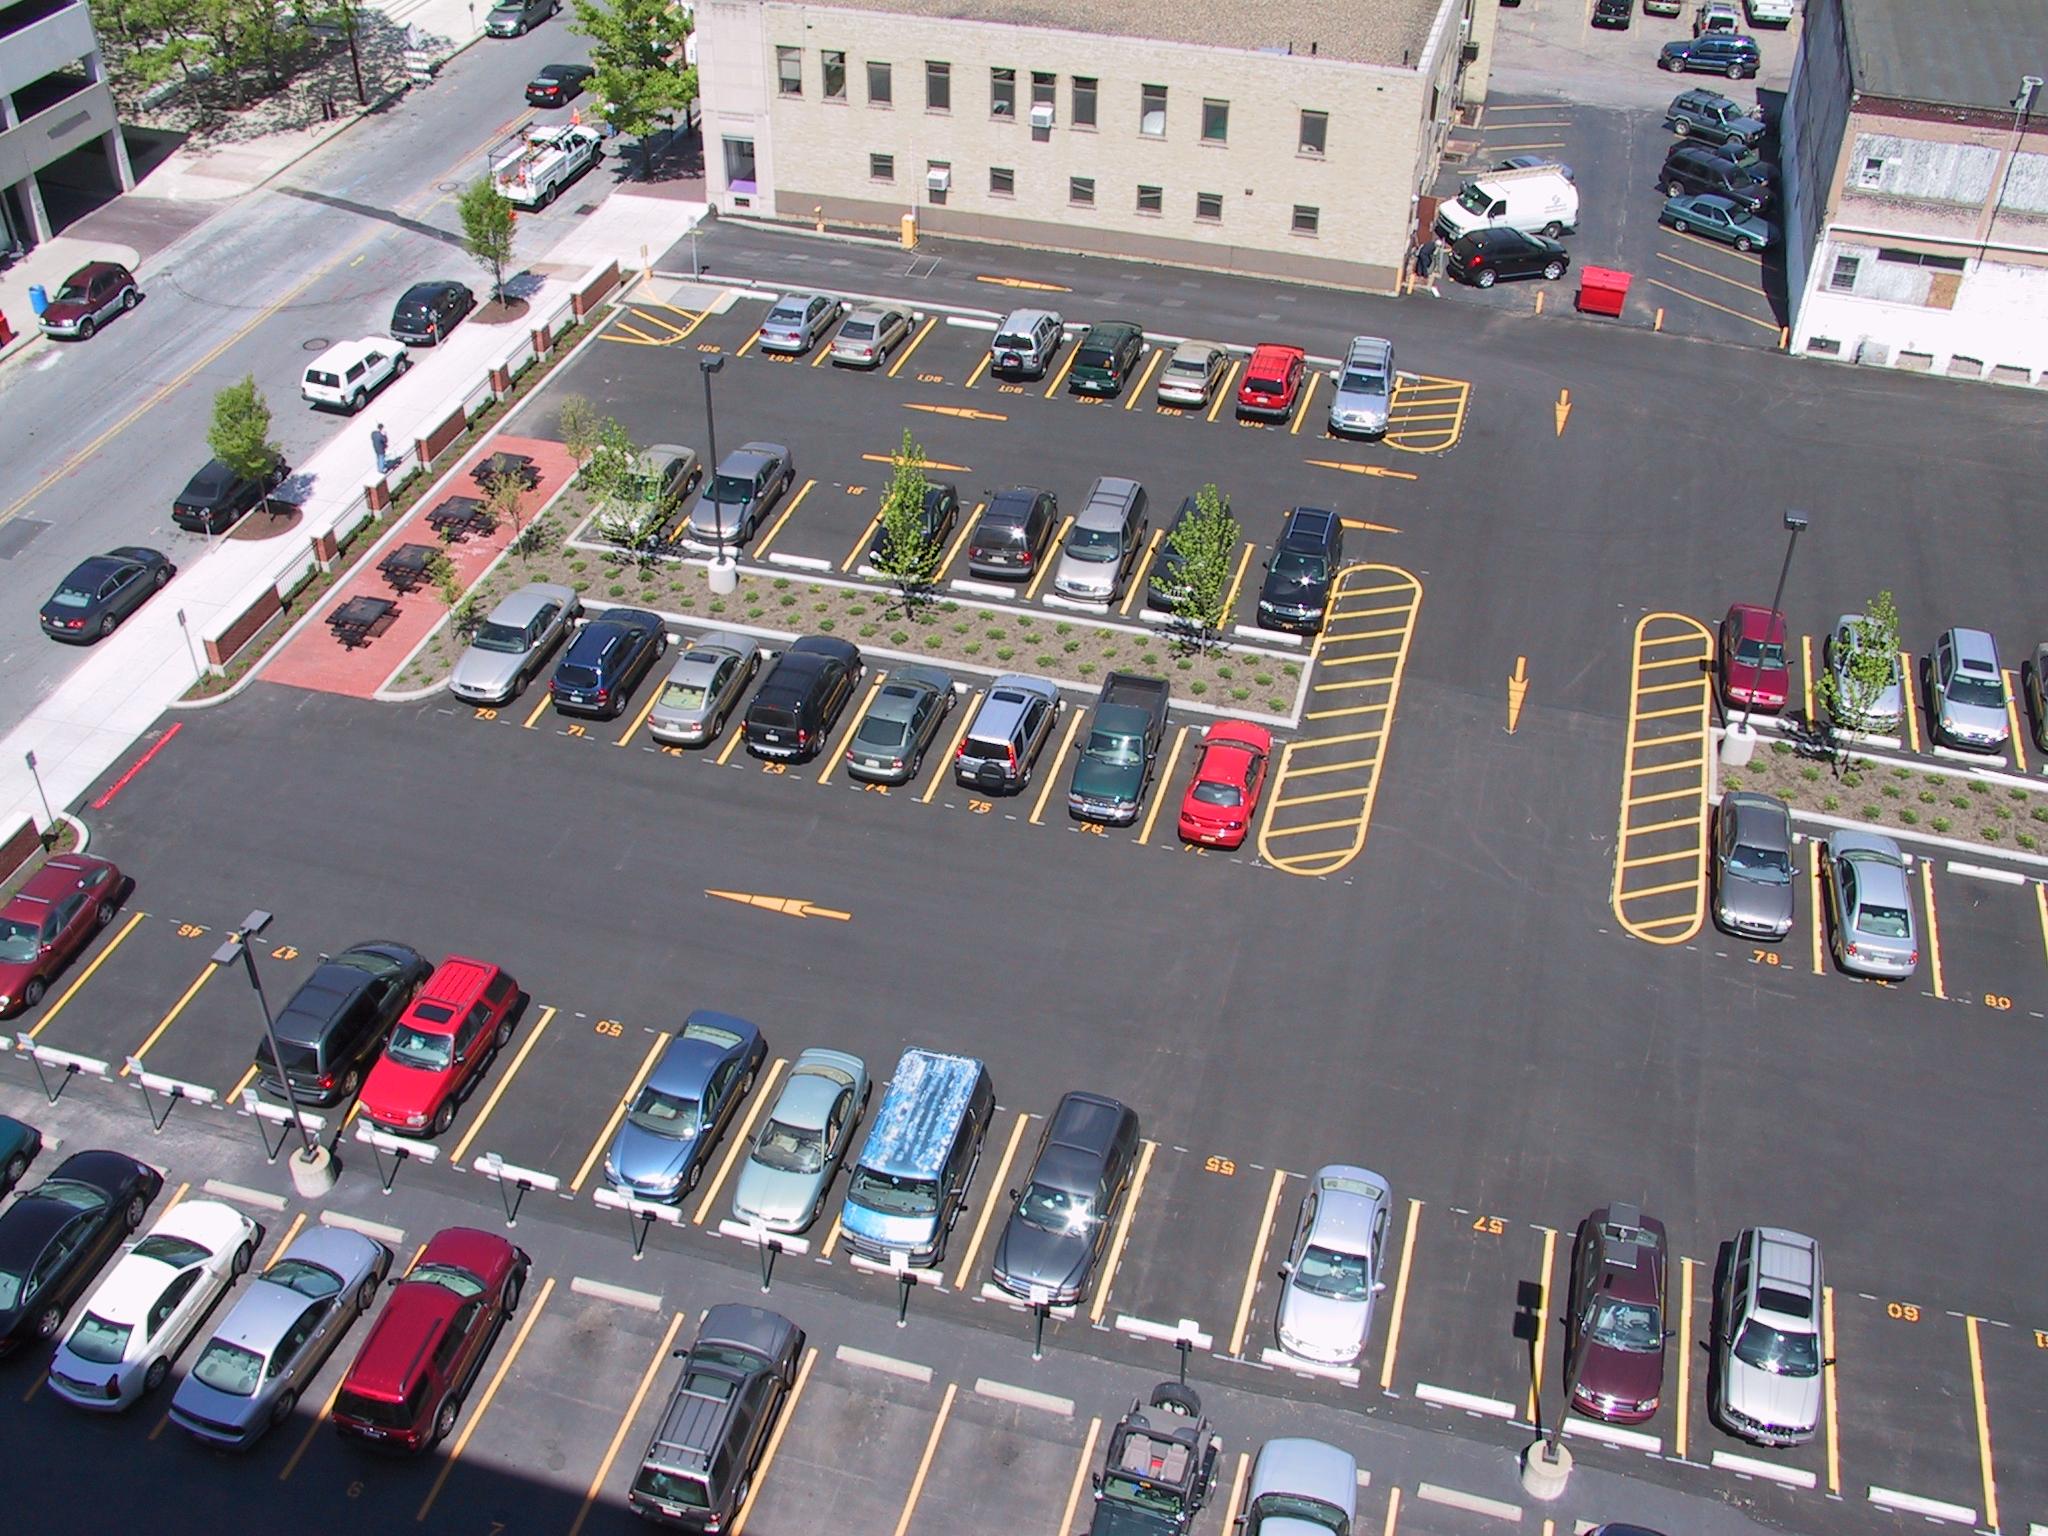 Quad 3 | Parking Lot Design/Building Demolition